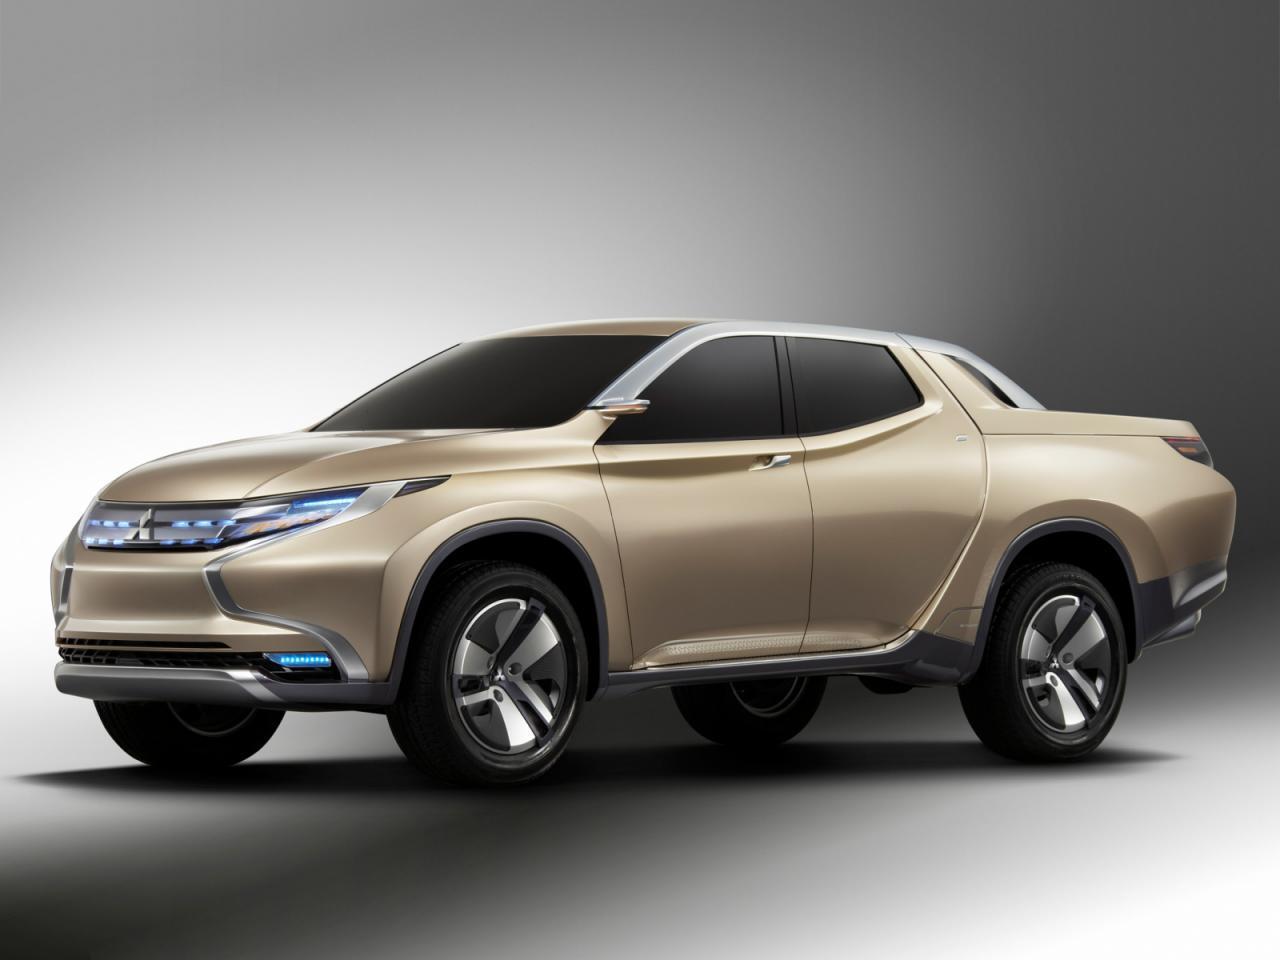 Mitsubishi Concept GR-HEV Sport Utility Hybrid Truck – tak brzmi